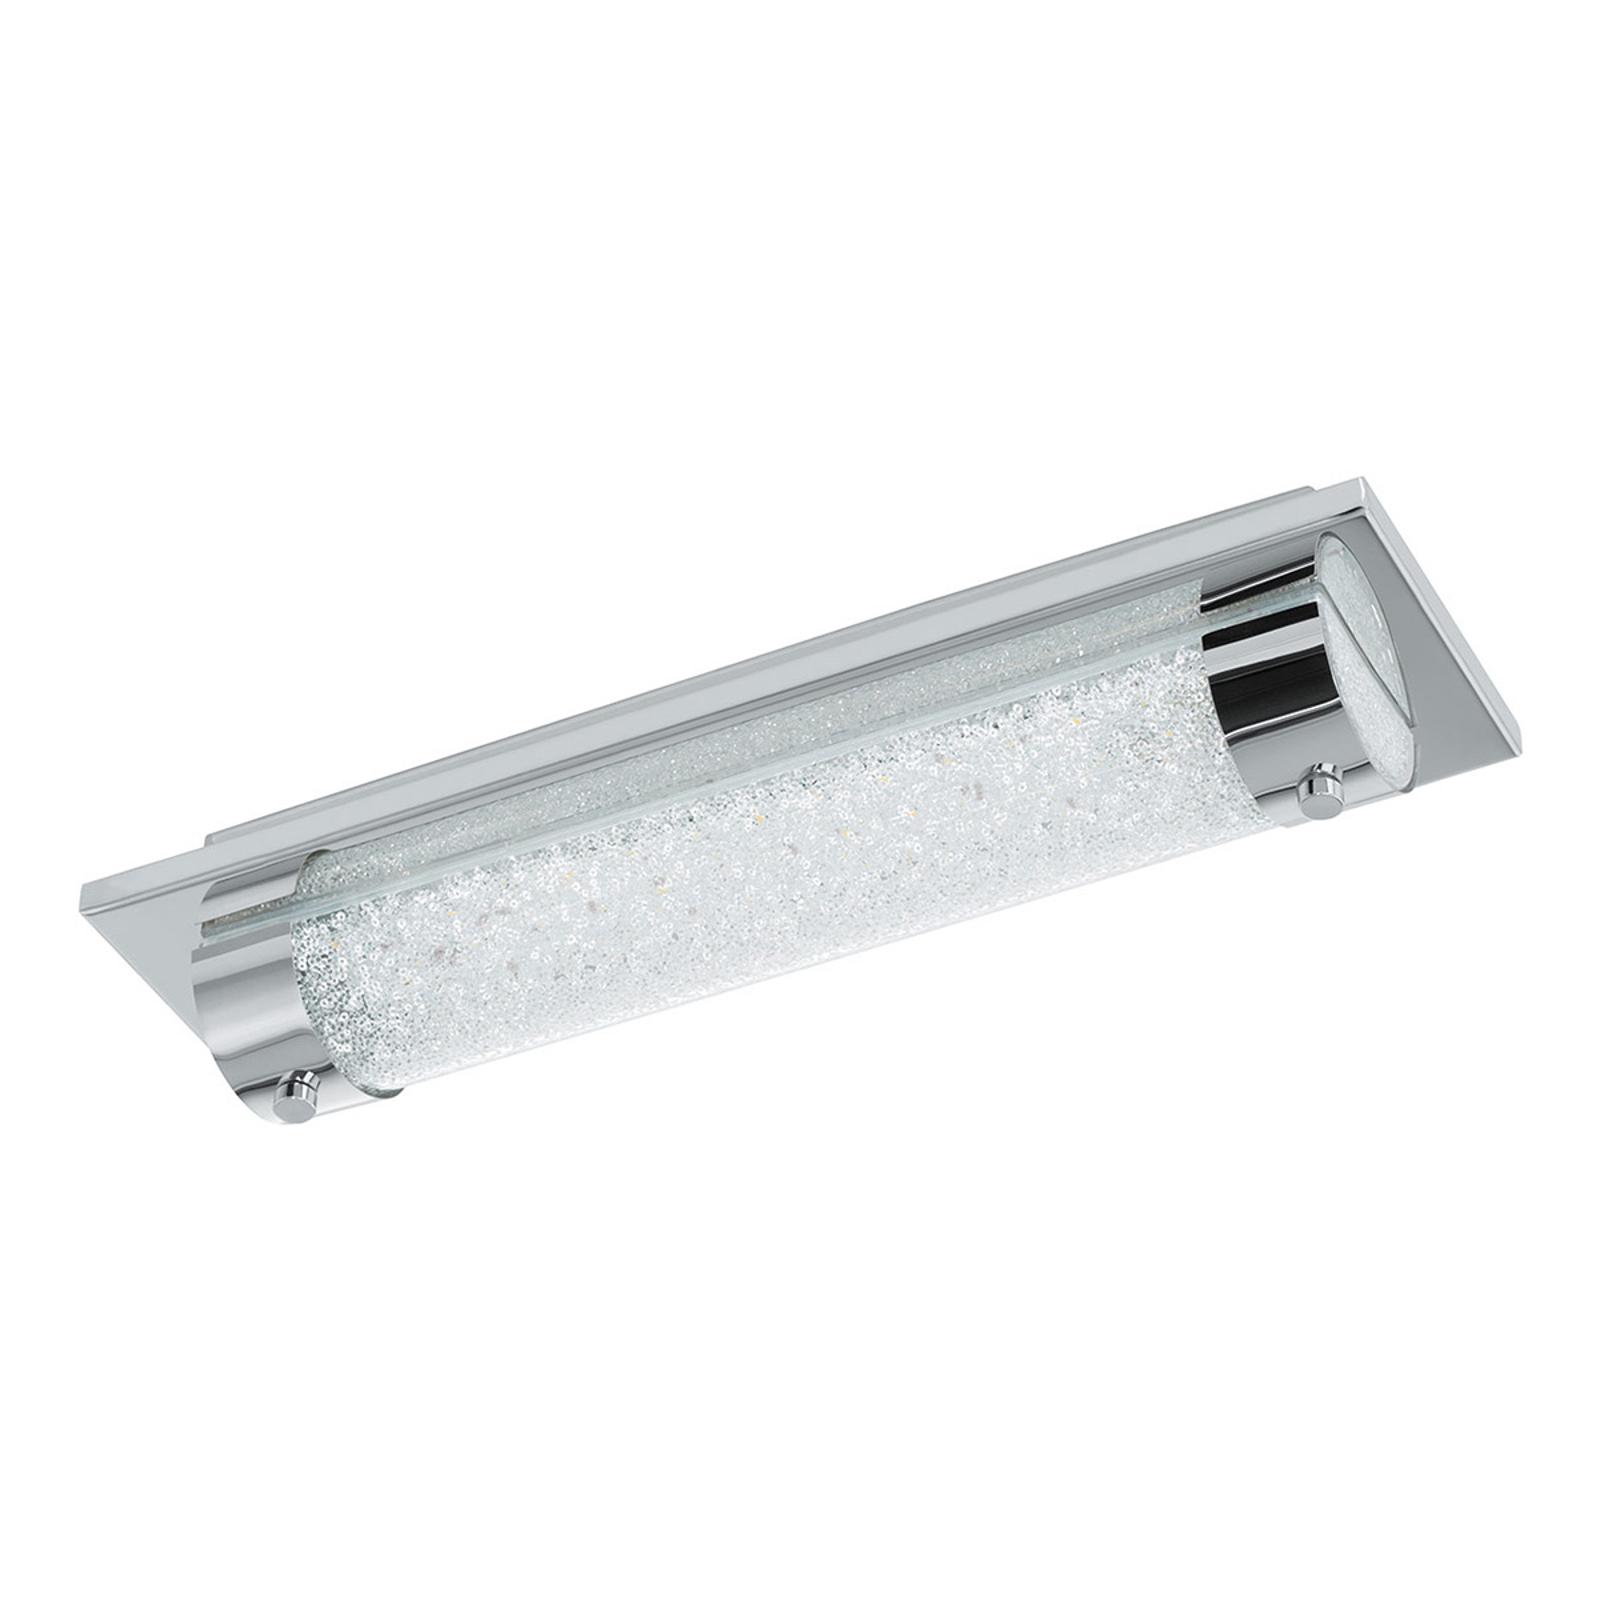 LED-taklampa Tolorico, 35 cm lång